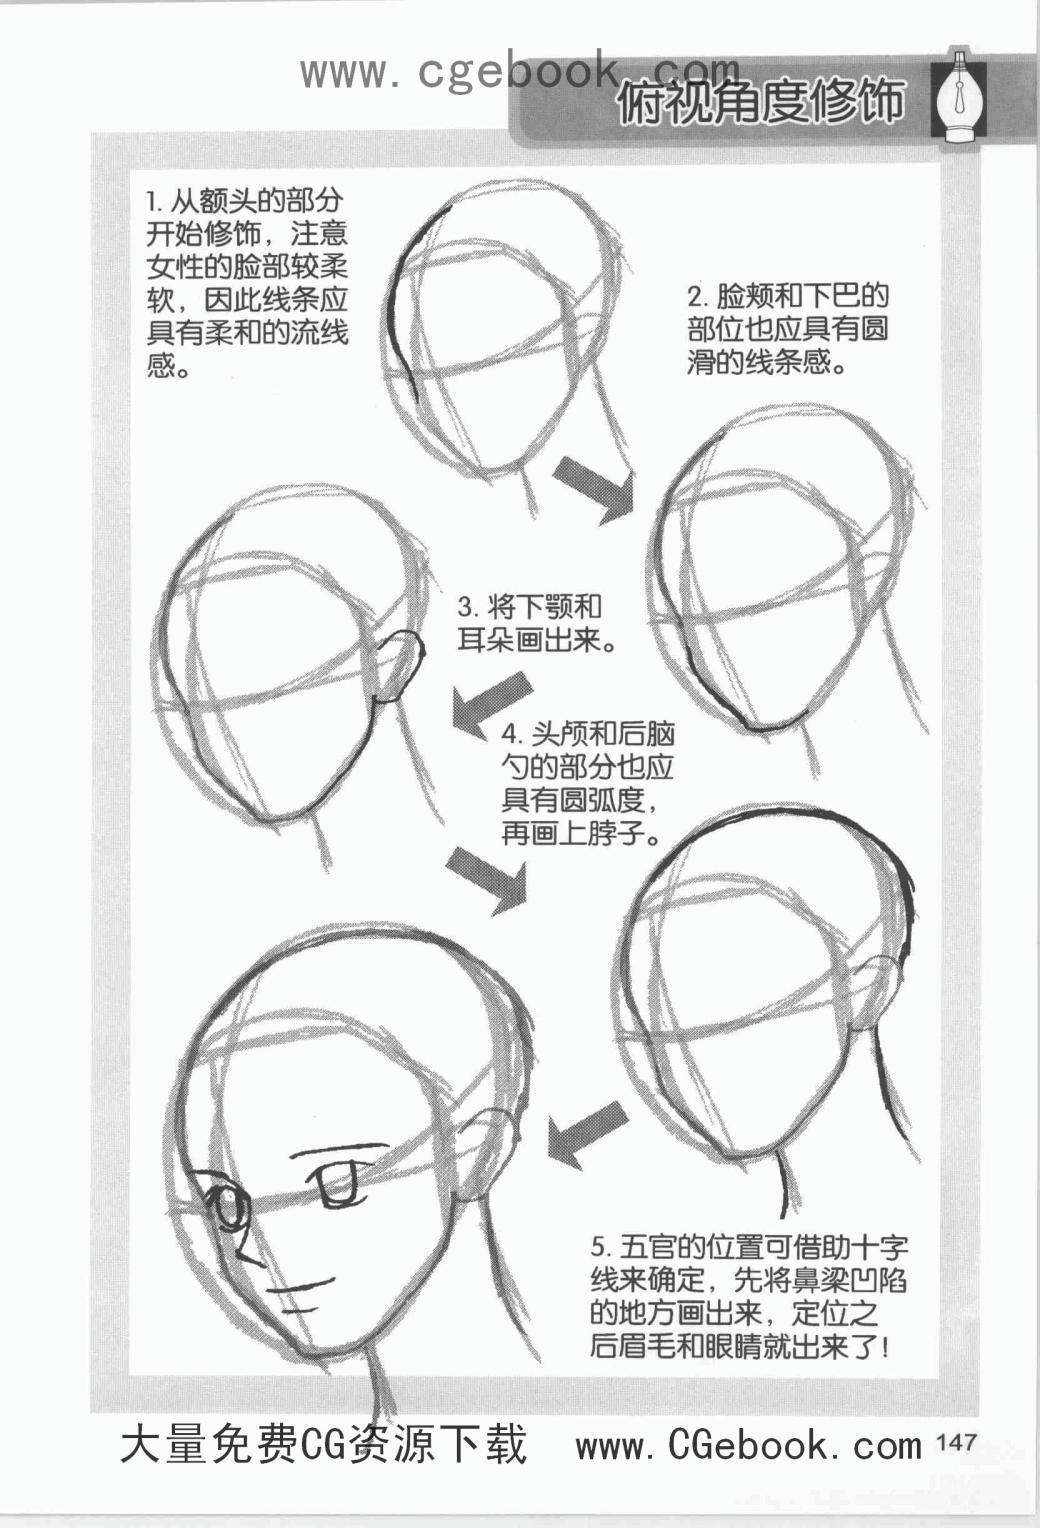 Cómo Dibujar Manga 0l946joggzhxuflfg